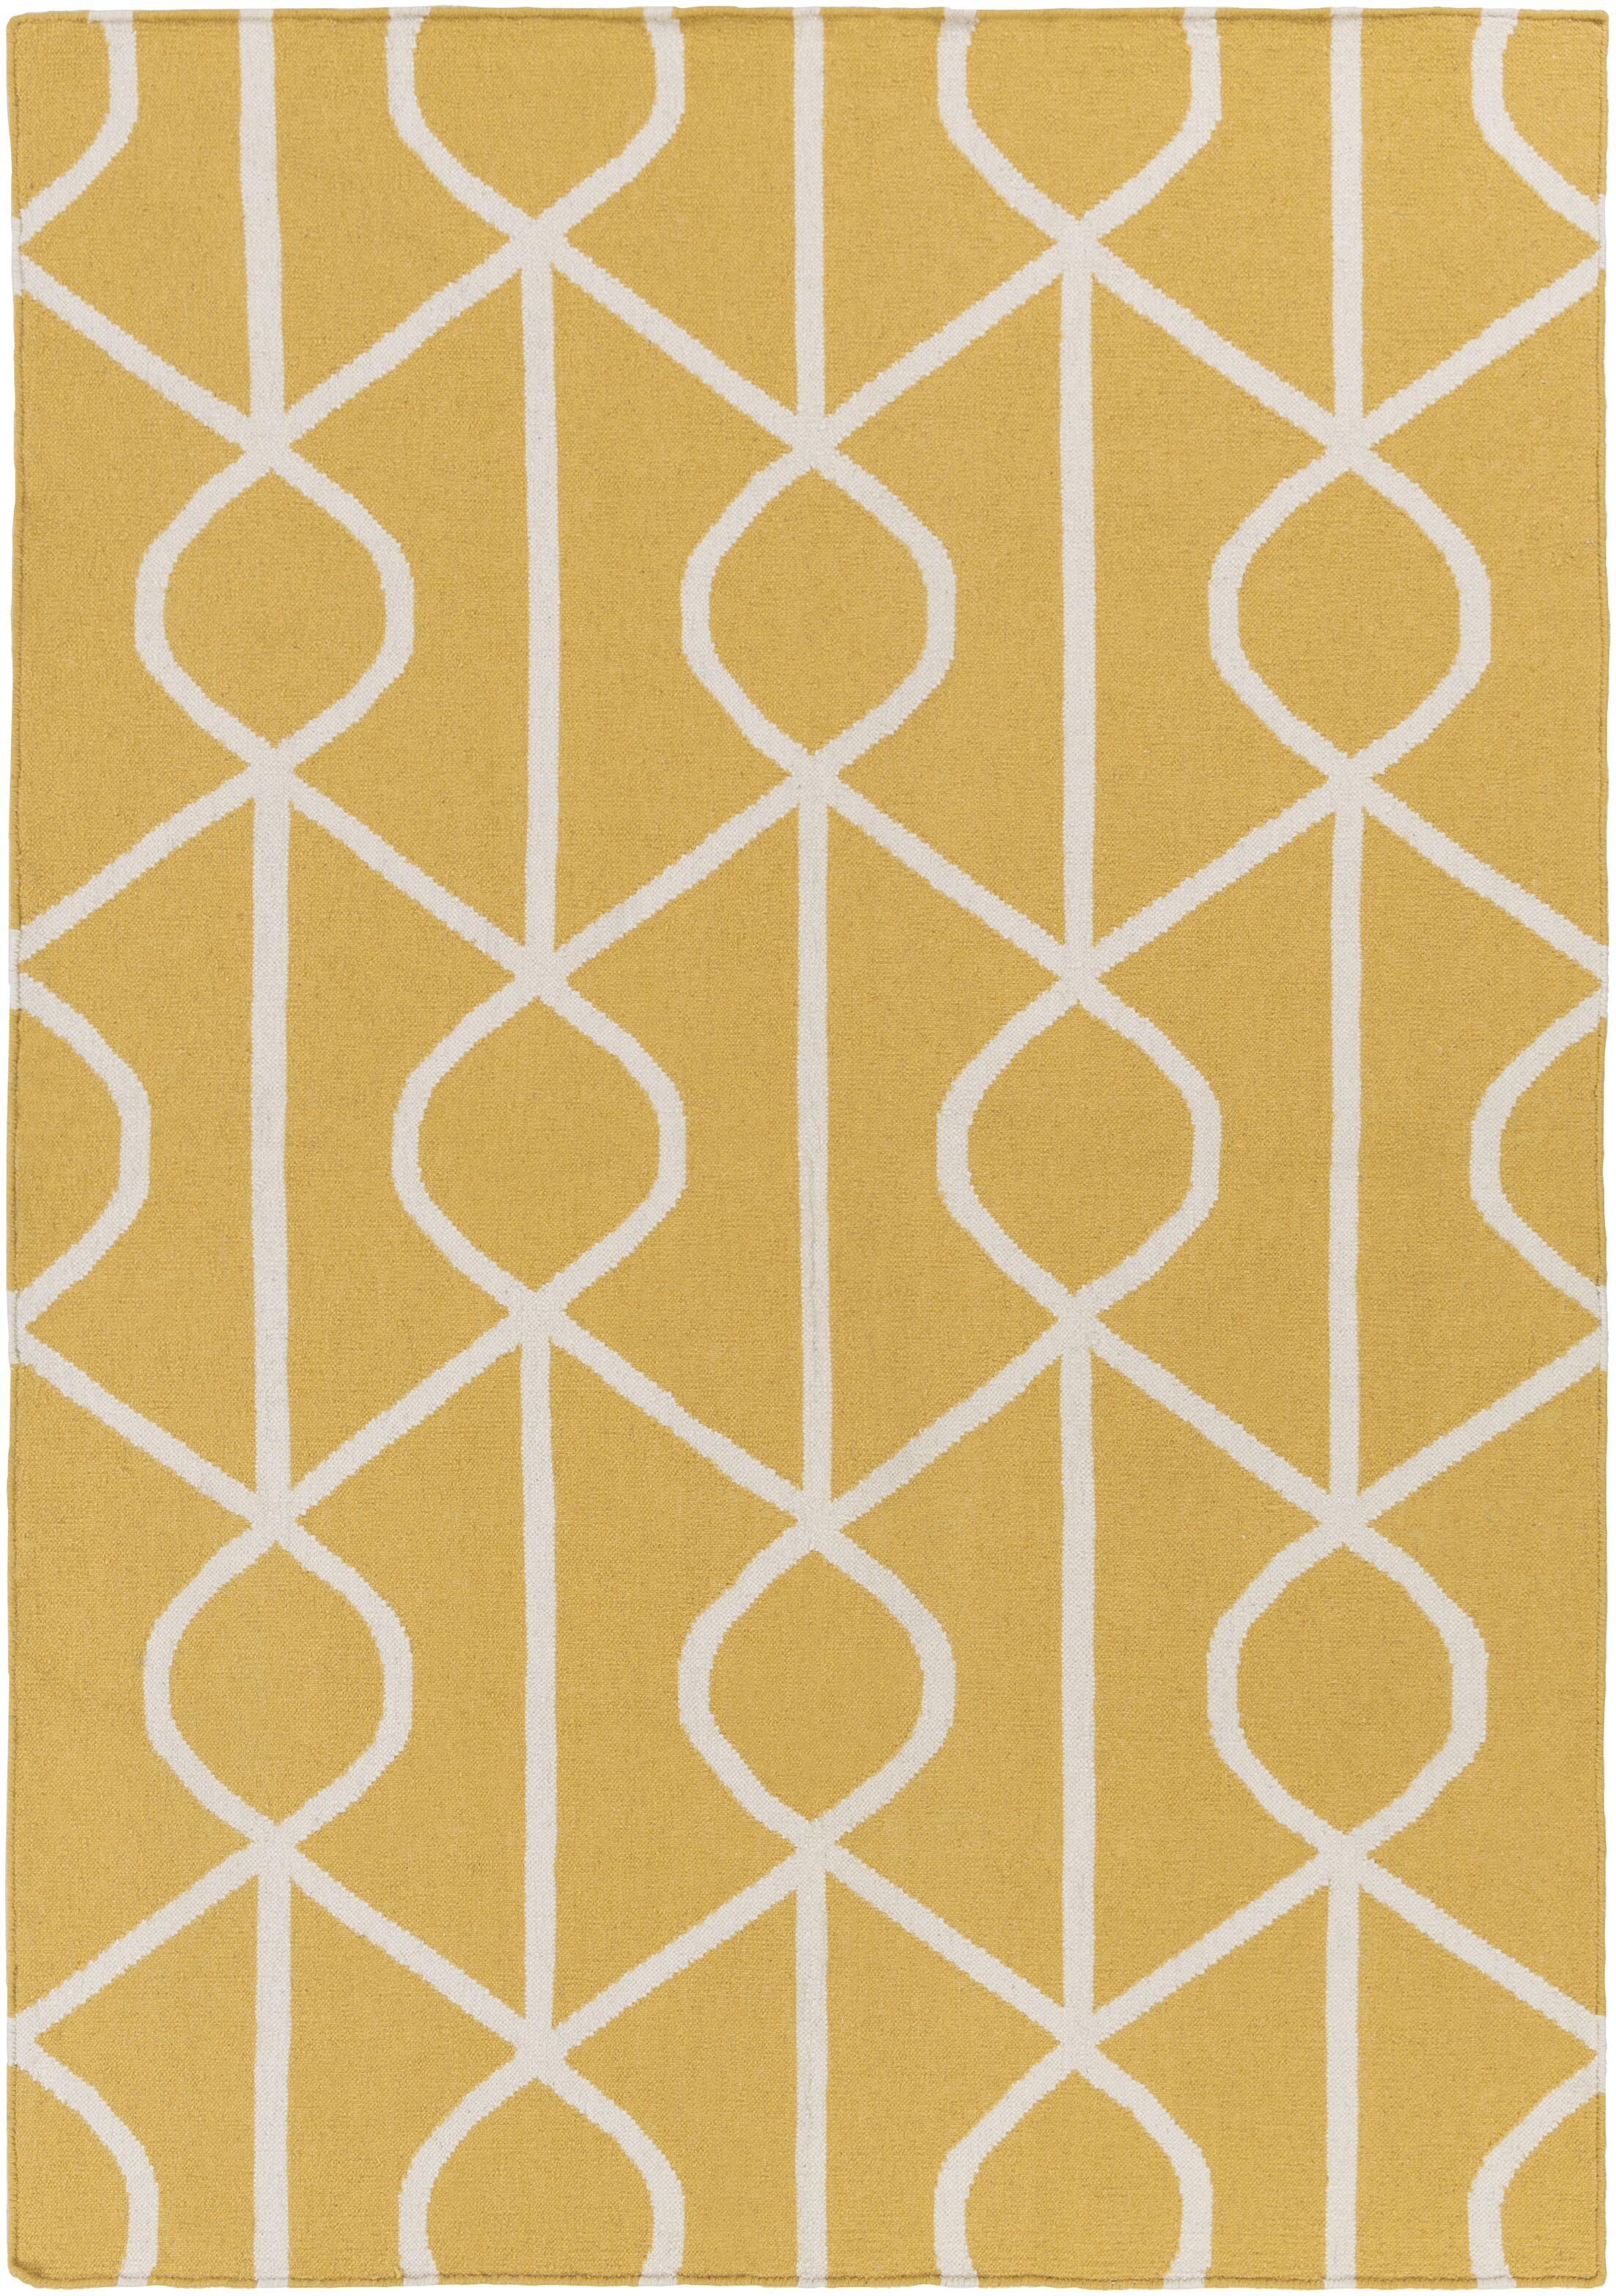 Murrill Yellow Area Rug Rug Size: Rectangle 5' x 8'